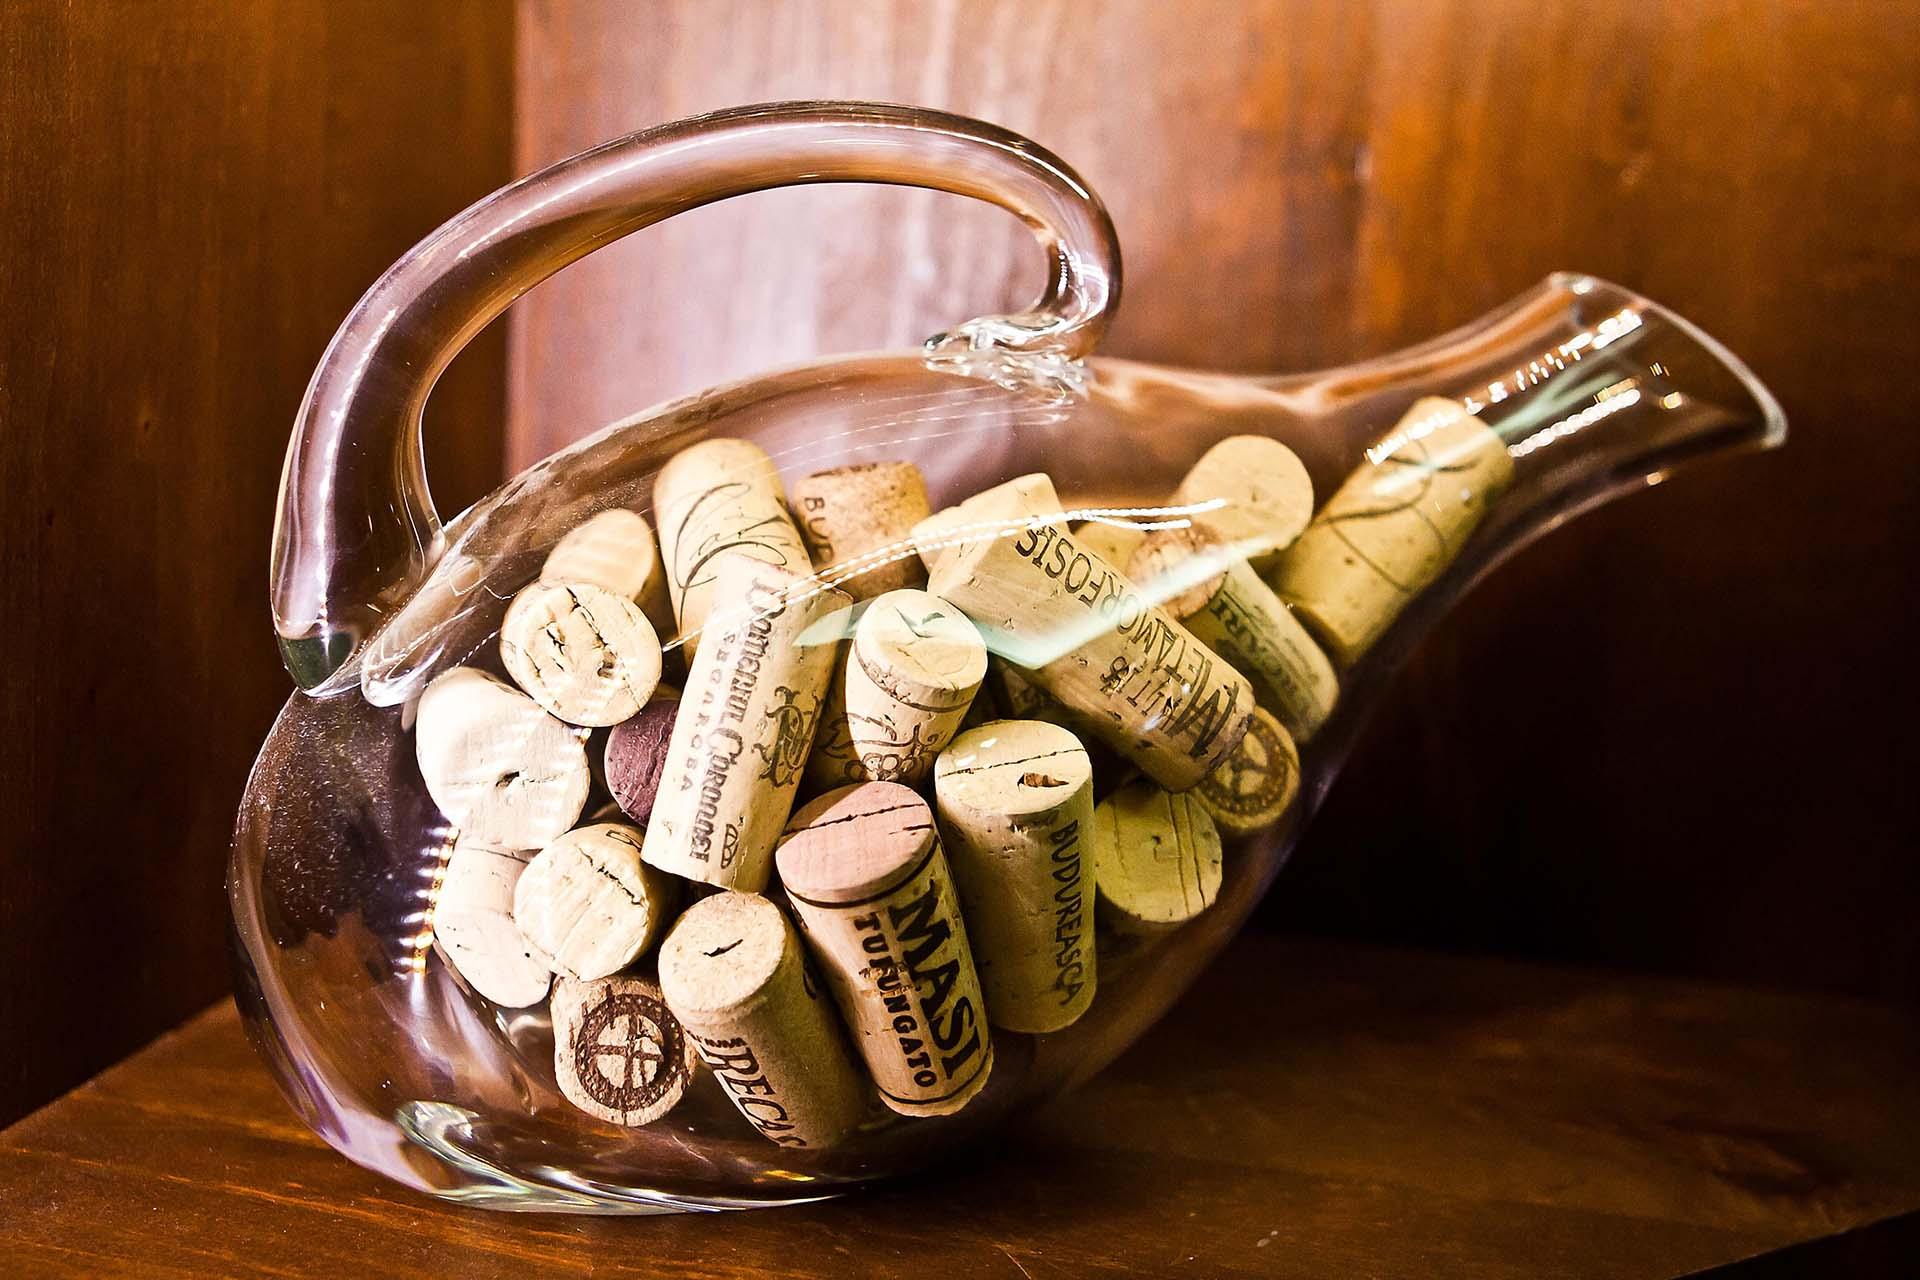 Doit-on carafer ou décanter le vin ?